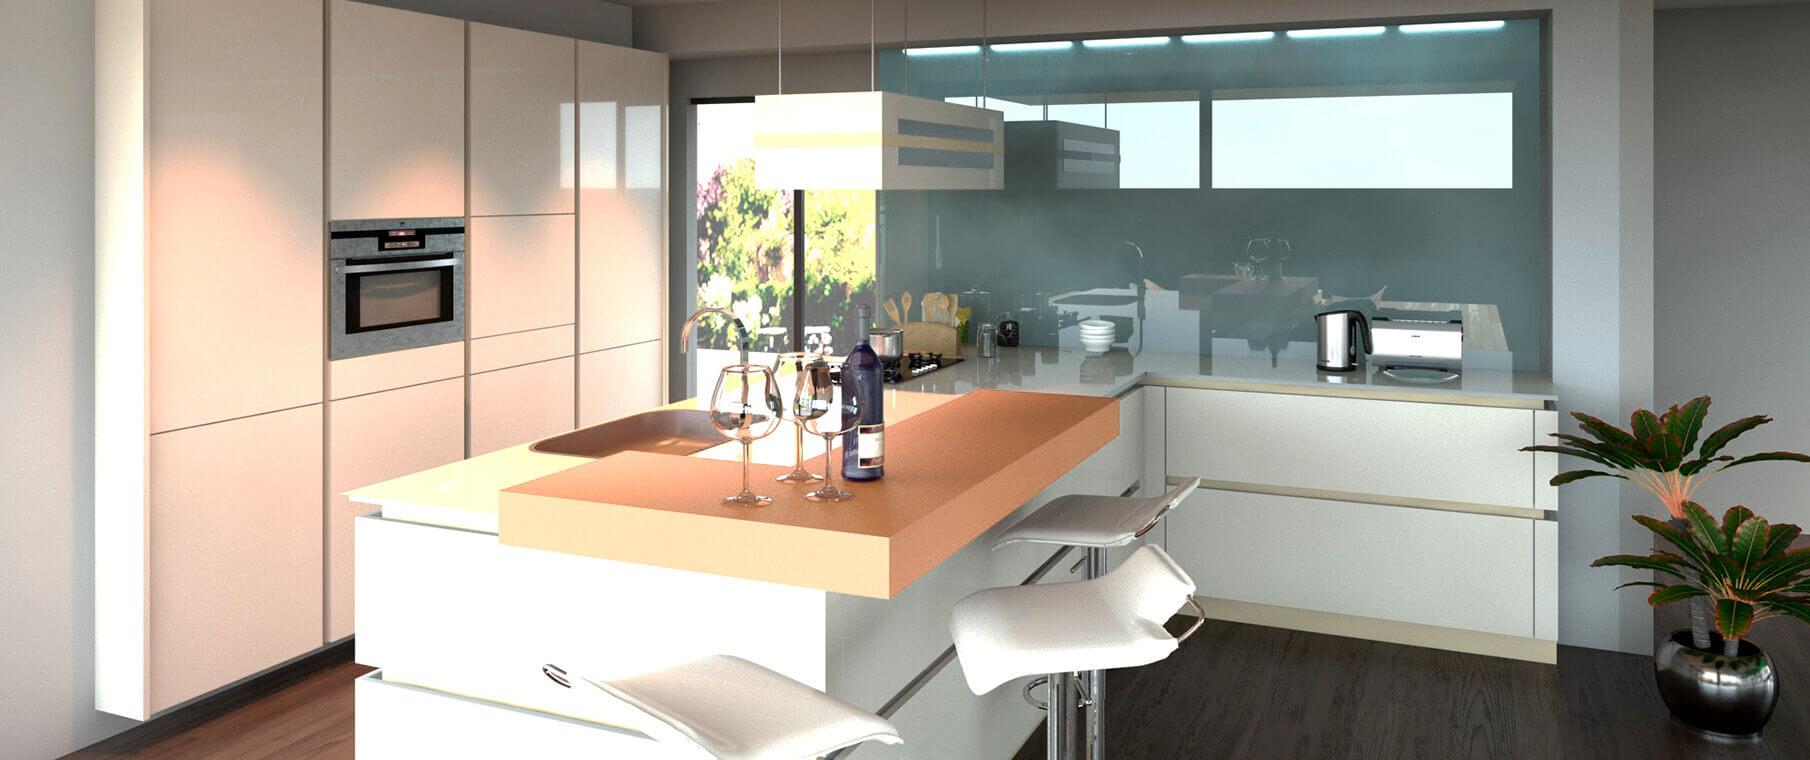 Küche - Provitrum